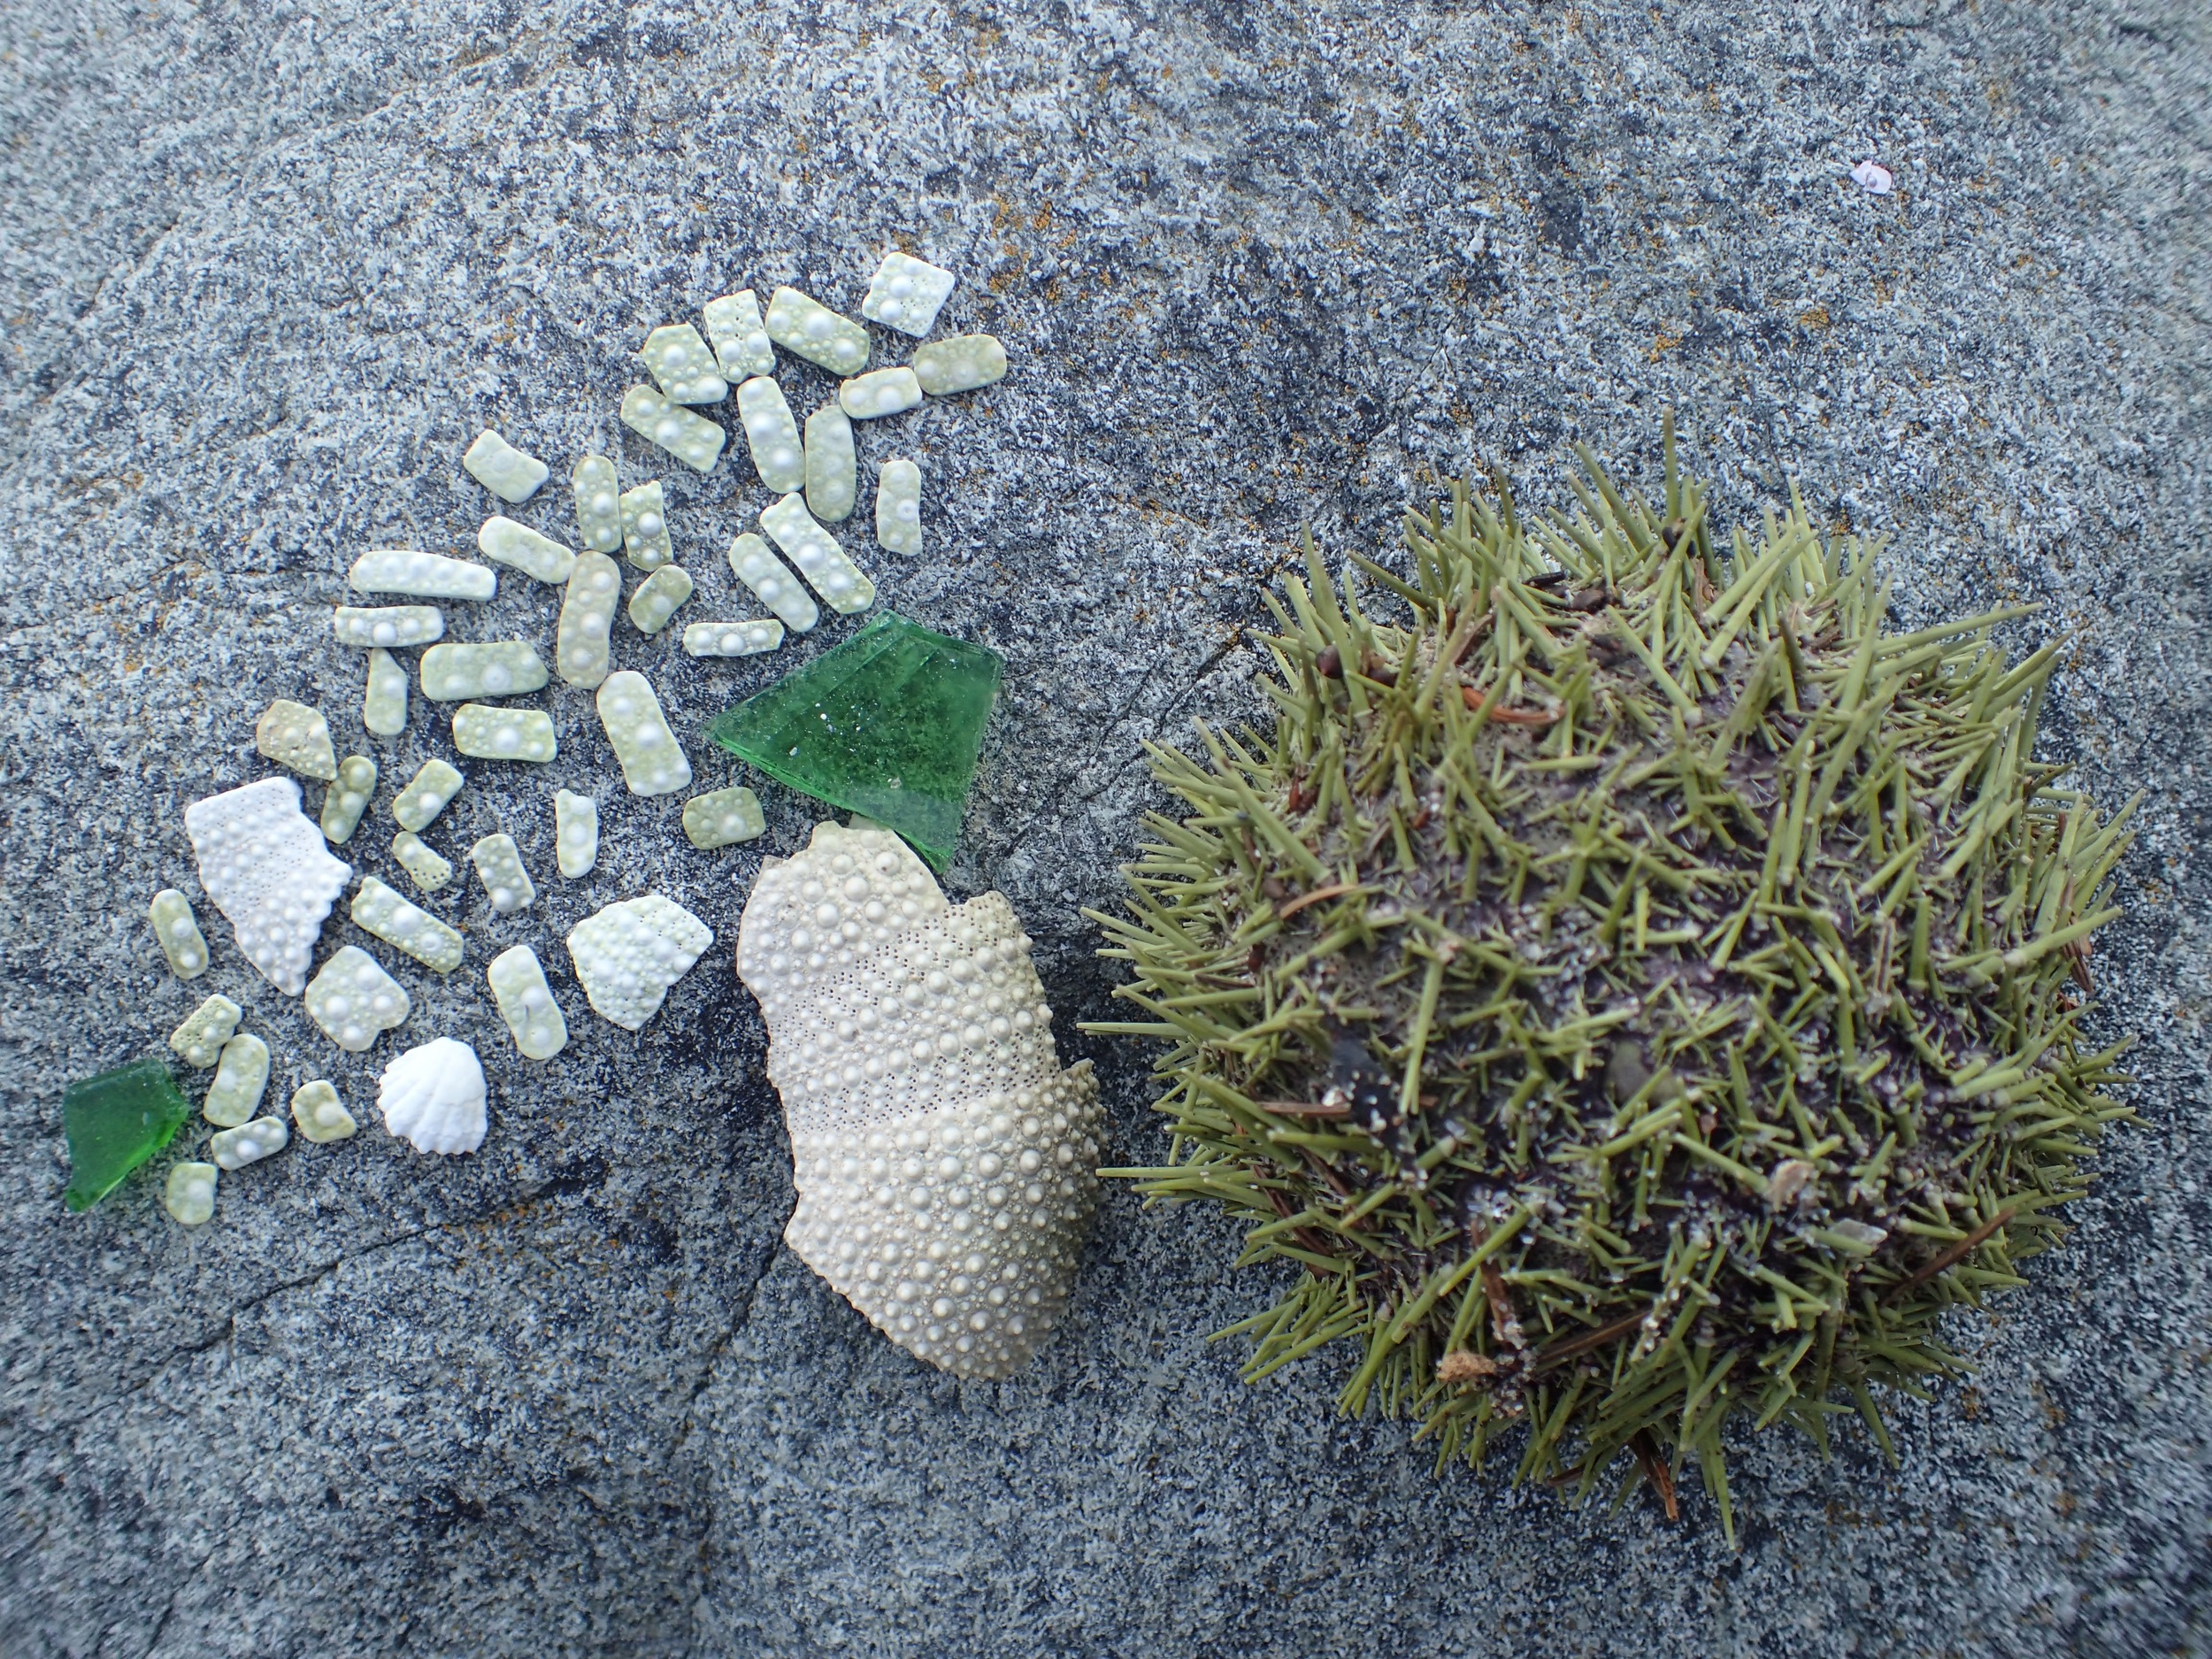 Island Art - sea urchin and beach-glass